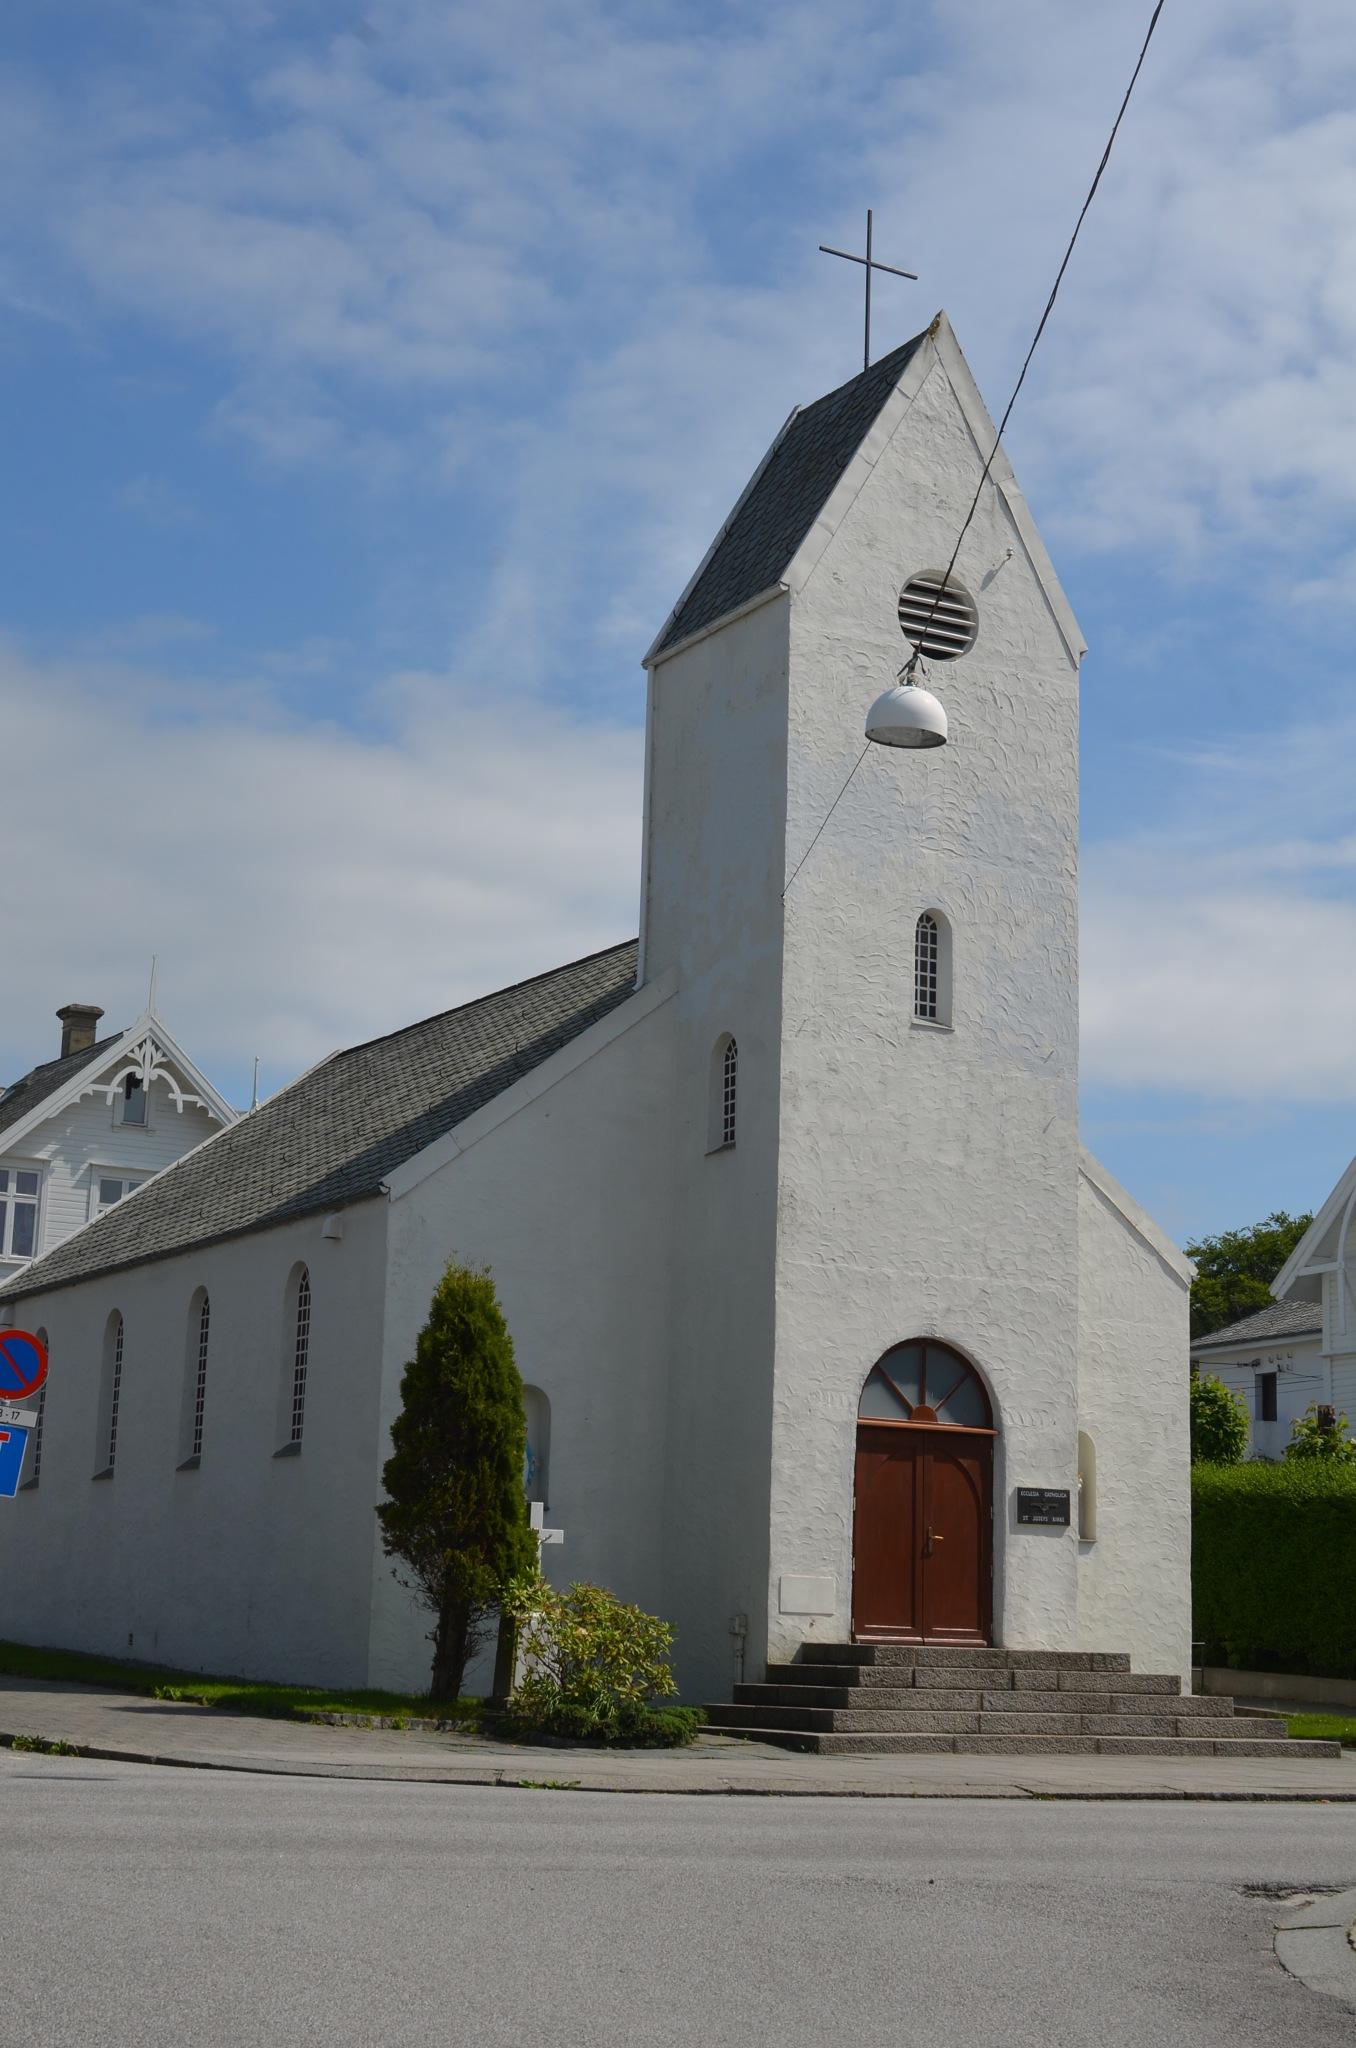 St. Josef Catholic Church, Haugesund by Lars-Toralf Utnes Storstrand